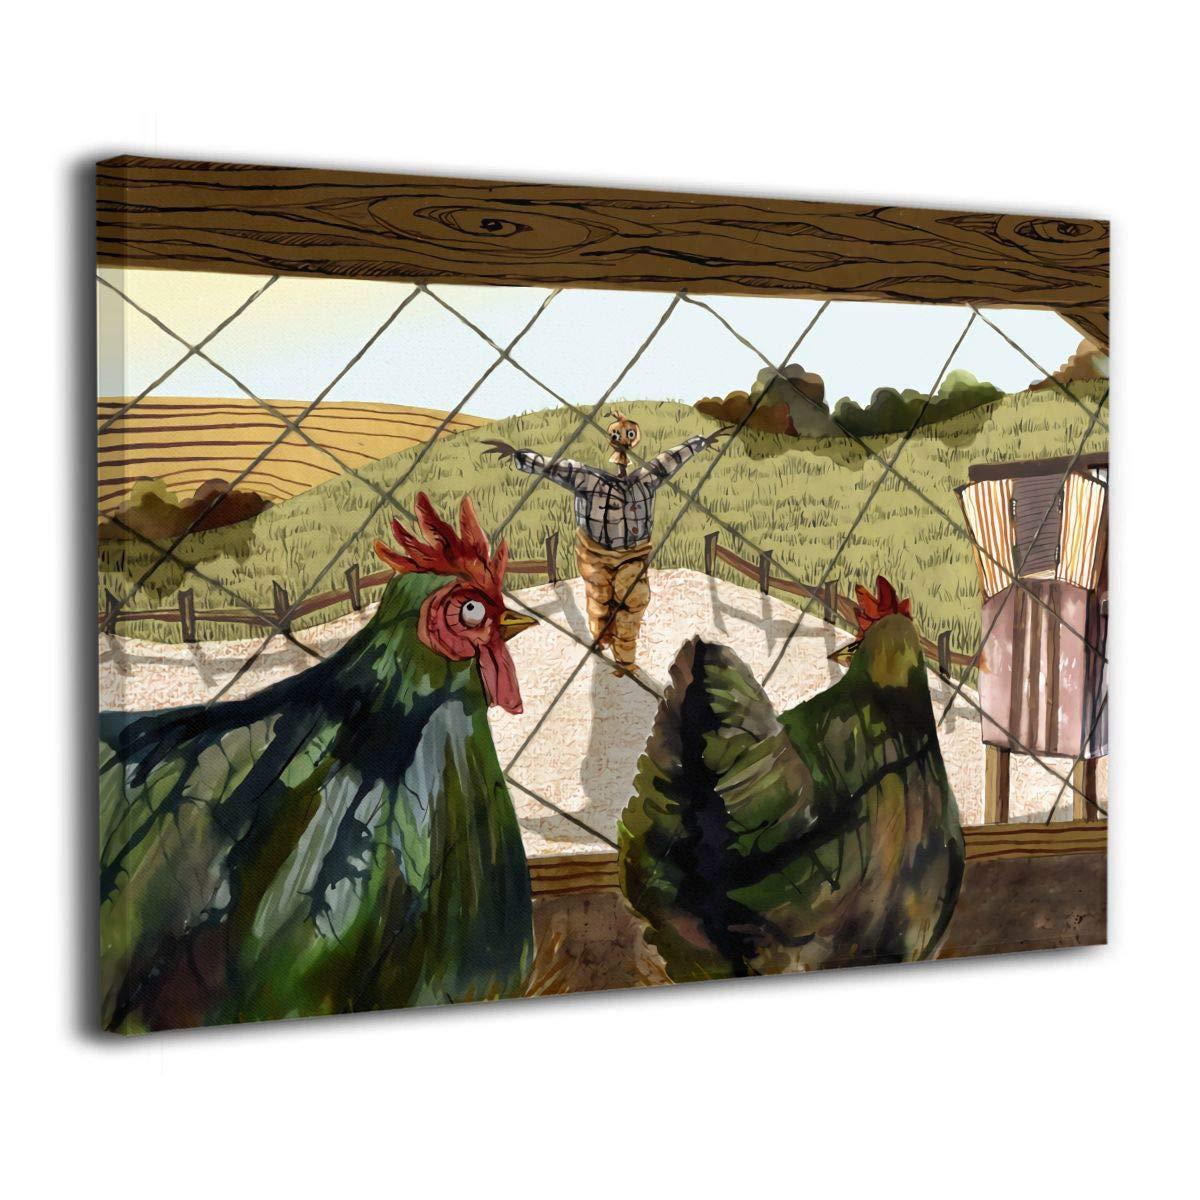 Little Monster Roosters Framed Printing On Canvas Wall Decor Modern Artwork Art for Child Bedroom